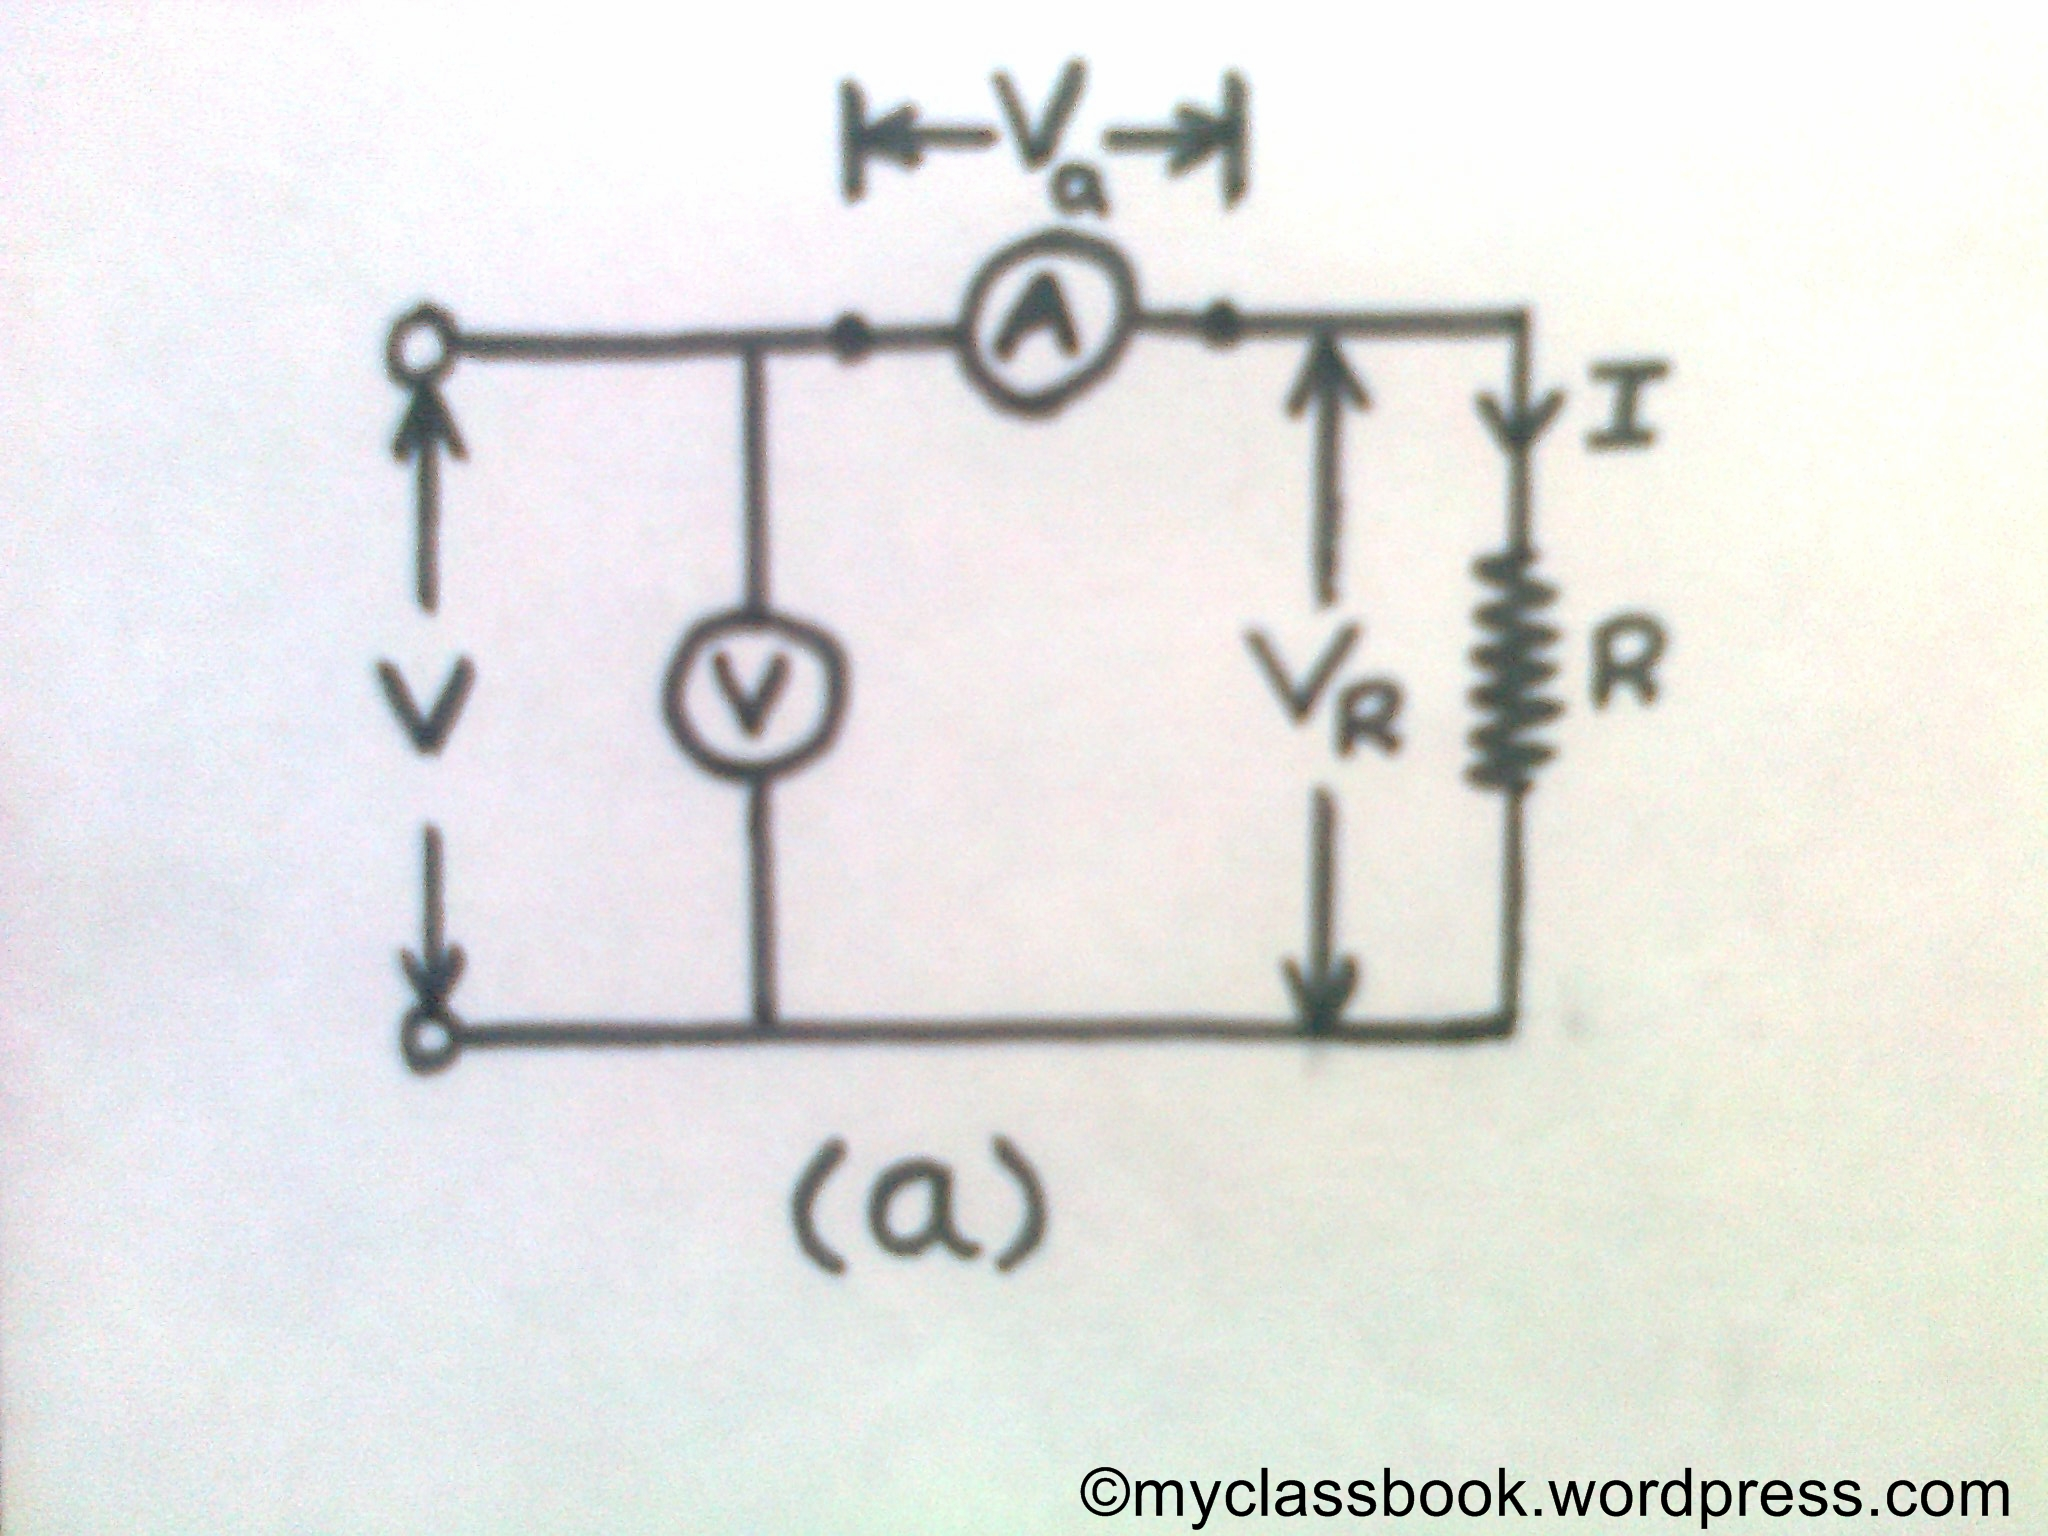 Myclassbook Mt8870 Dtmf Telephone Dial Tone Decoder Circuit Diagram Nonstopfree